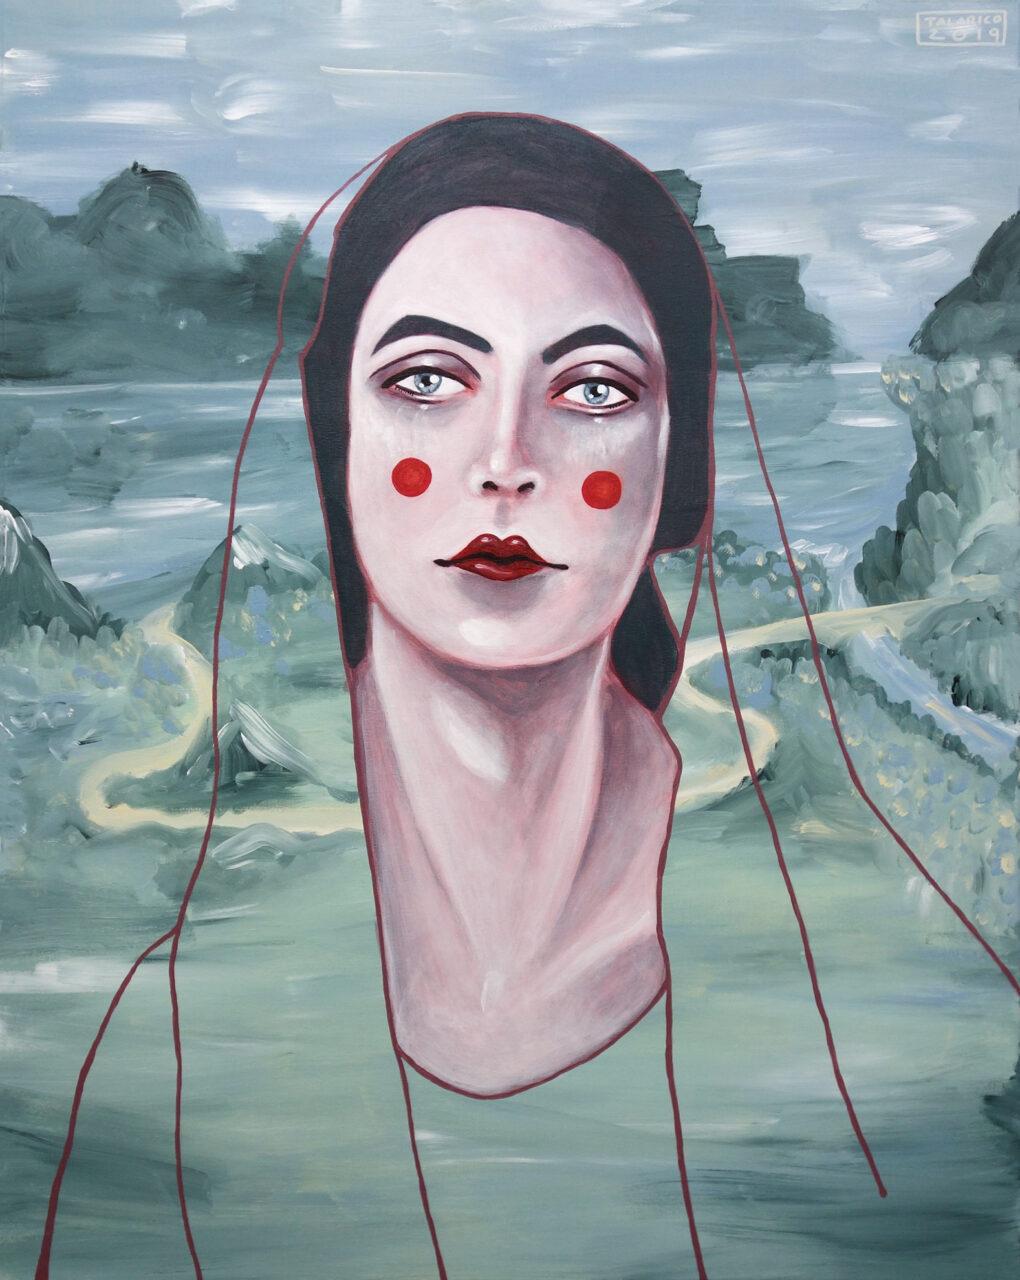 """Blurring Boundaries Between Far And Away #05"" • 80 x 100cm • Acryl on canvas • 2019"